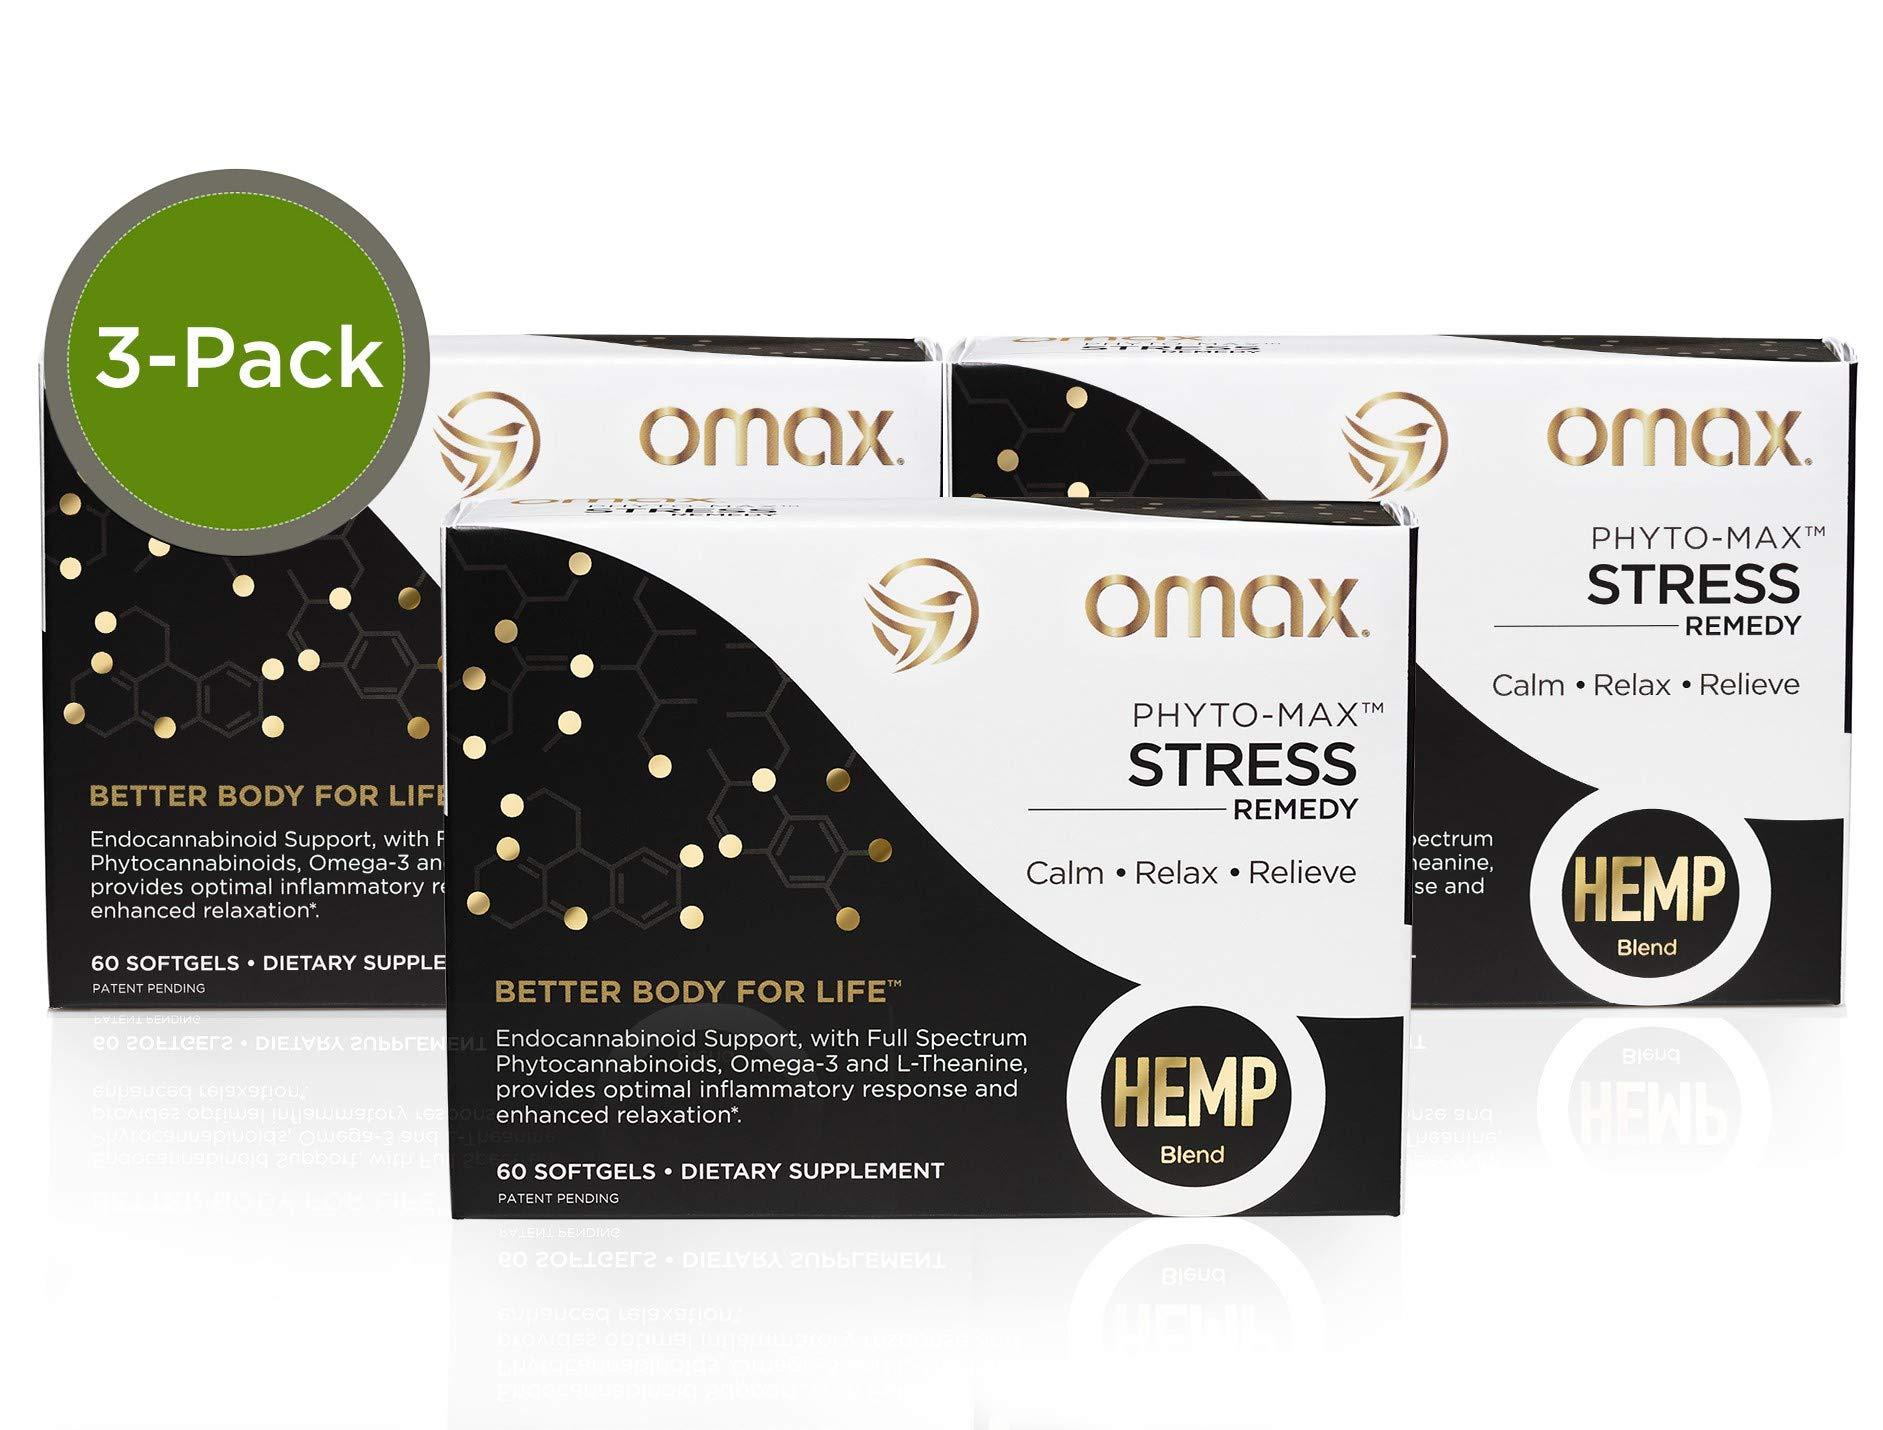 Omax® Sleep & Stress Remedy, Omega 3 L Theanine Hemp Fusion Blend, Sleep & Stress Remedy, Improve Sleep, Relax Body & Mind✱ European Sourced, cGMP, 3 Box (180 Softgels)